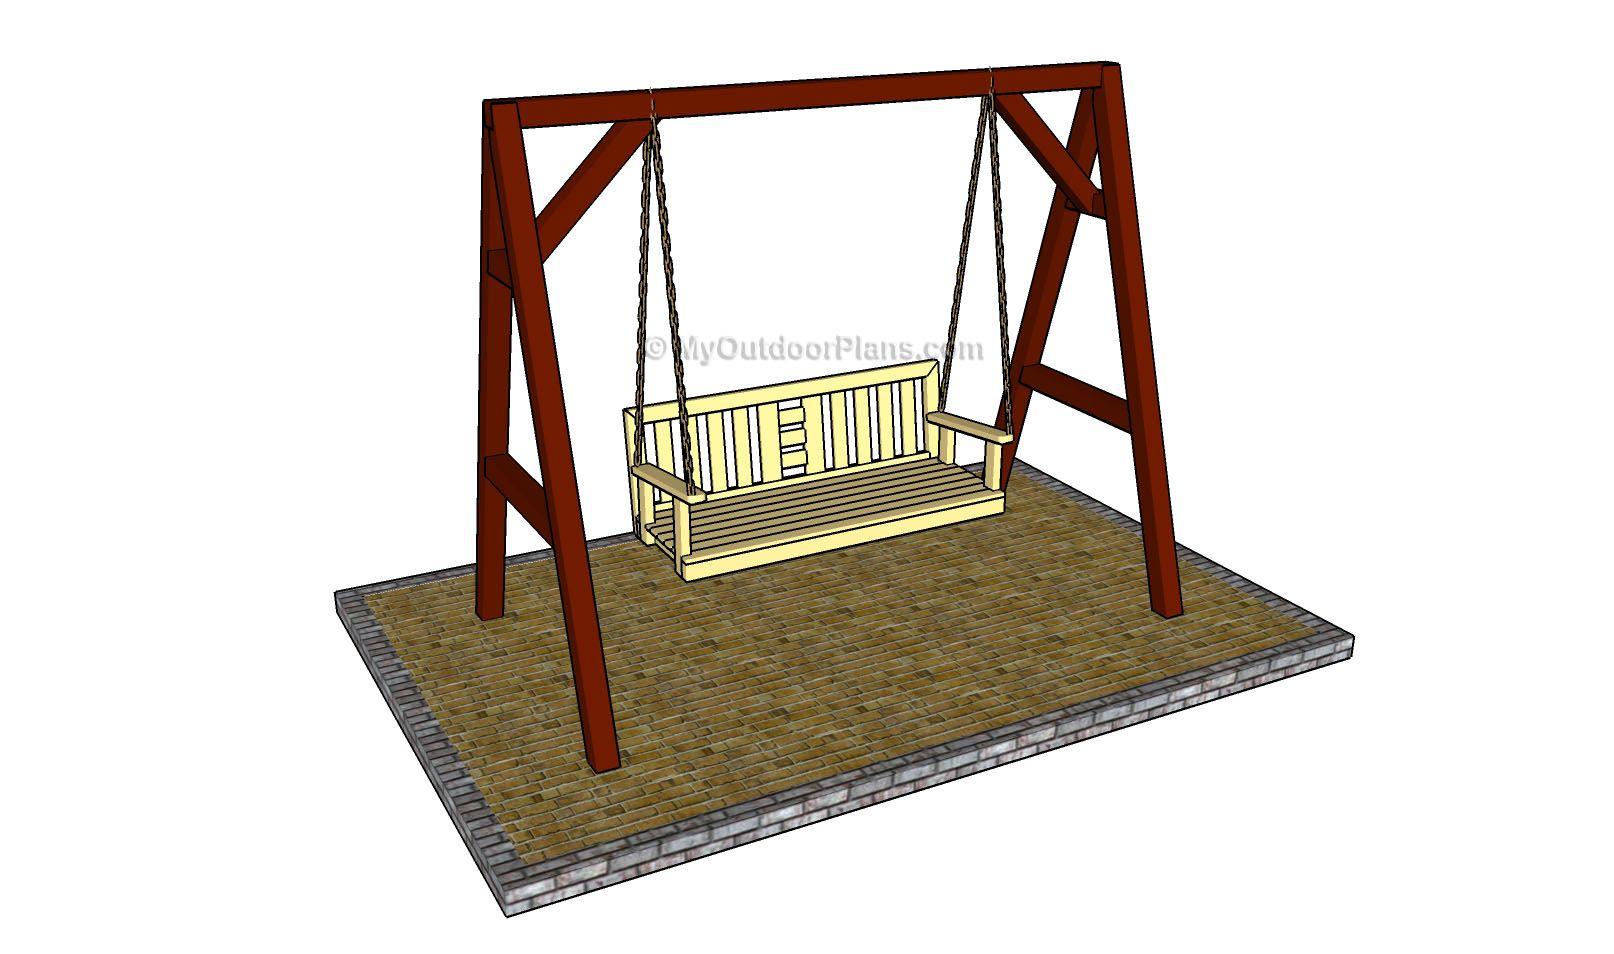 A Frame Swing Plans | Outdoor Furniture Plans | Pinterest | Swings ...